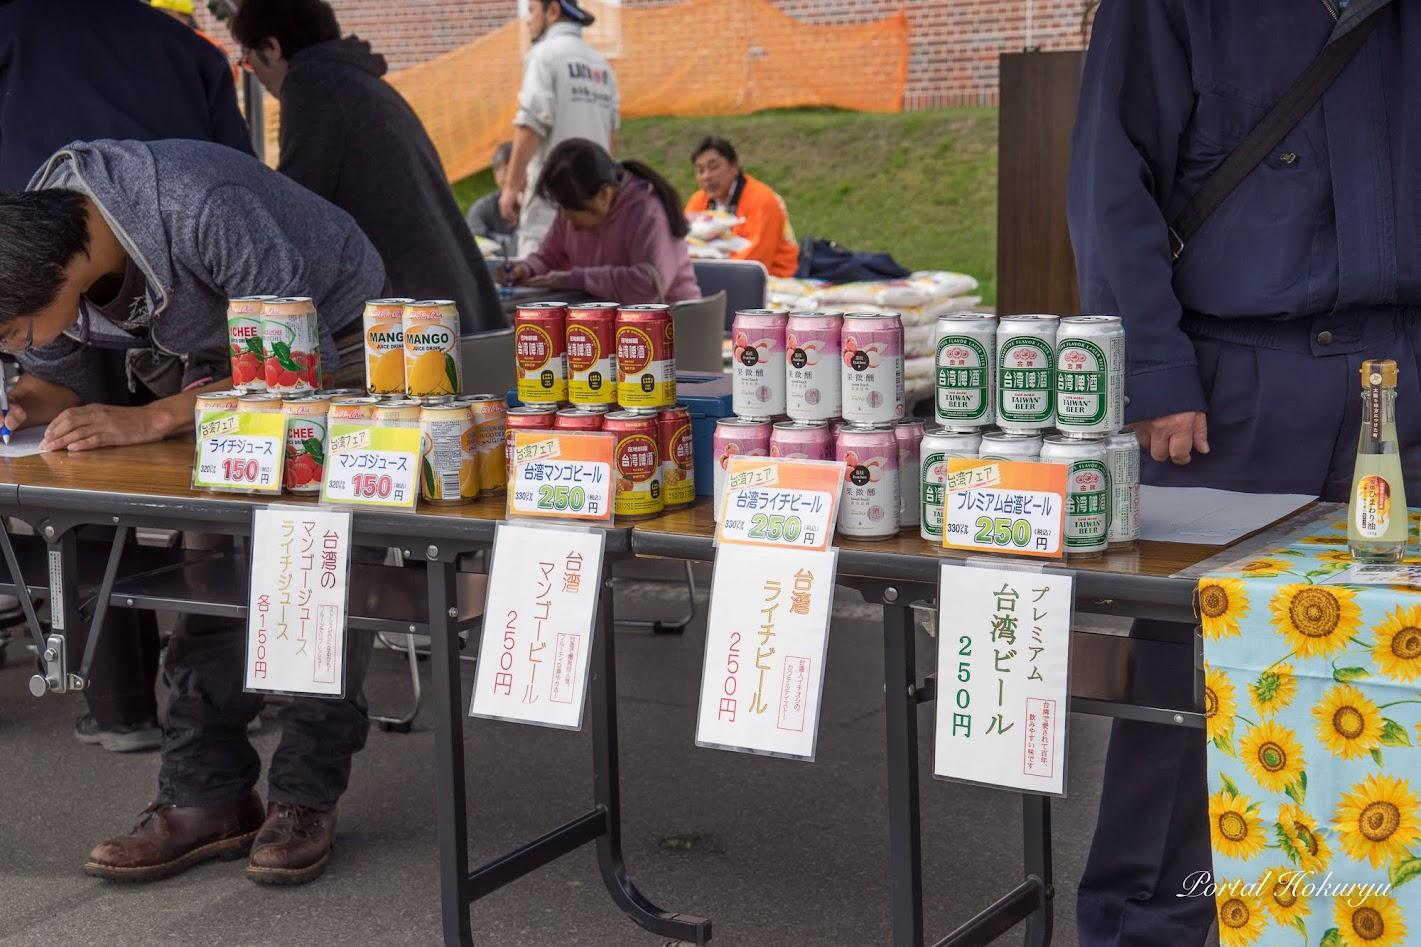 台湾の飲料商品も販売